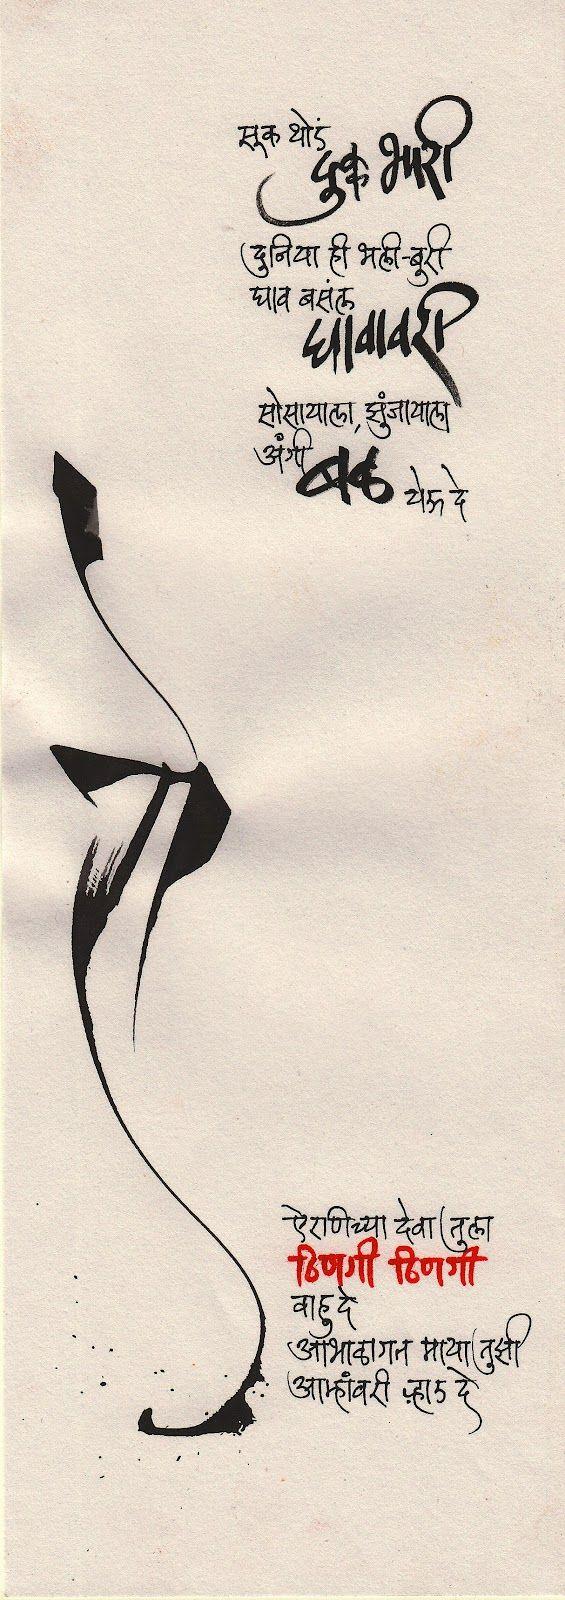 Calligraphy10.02.2012 (With images) Hindi calligraphy